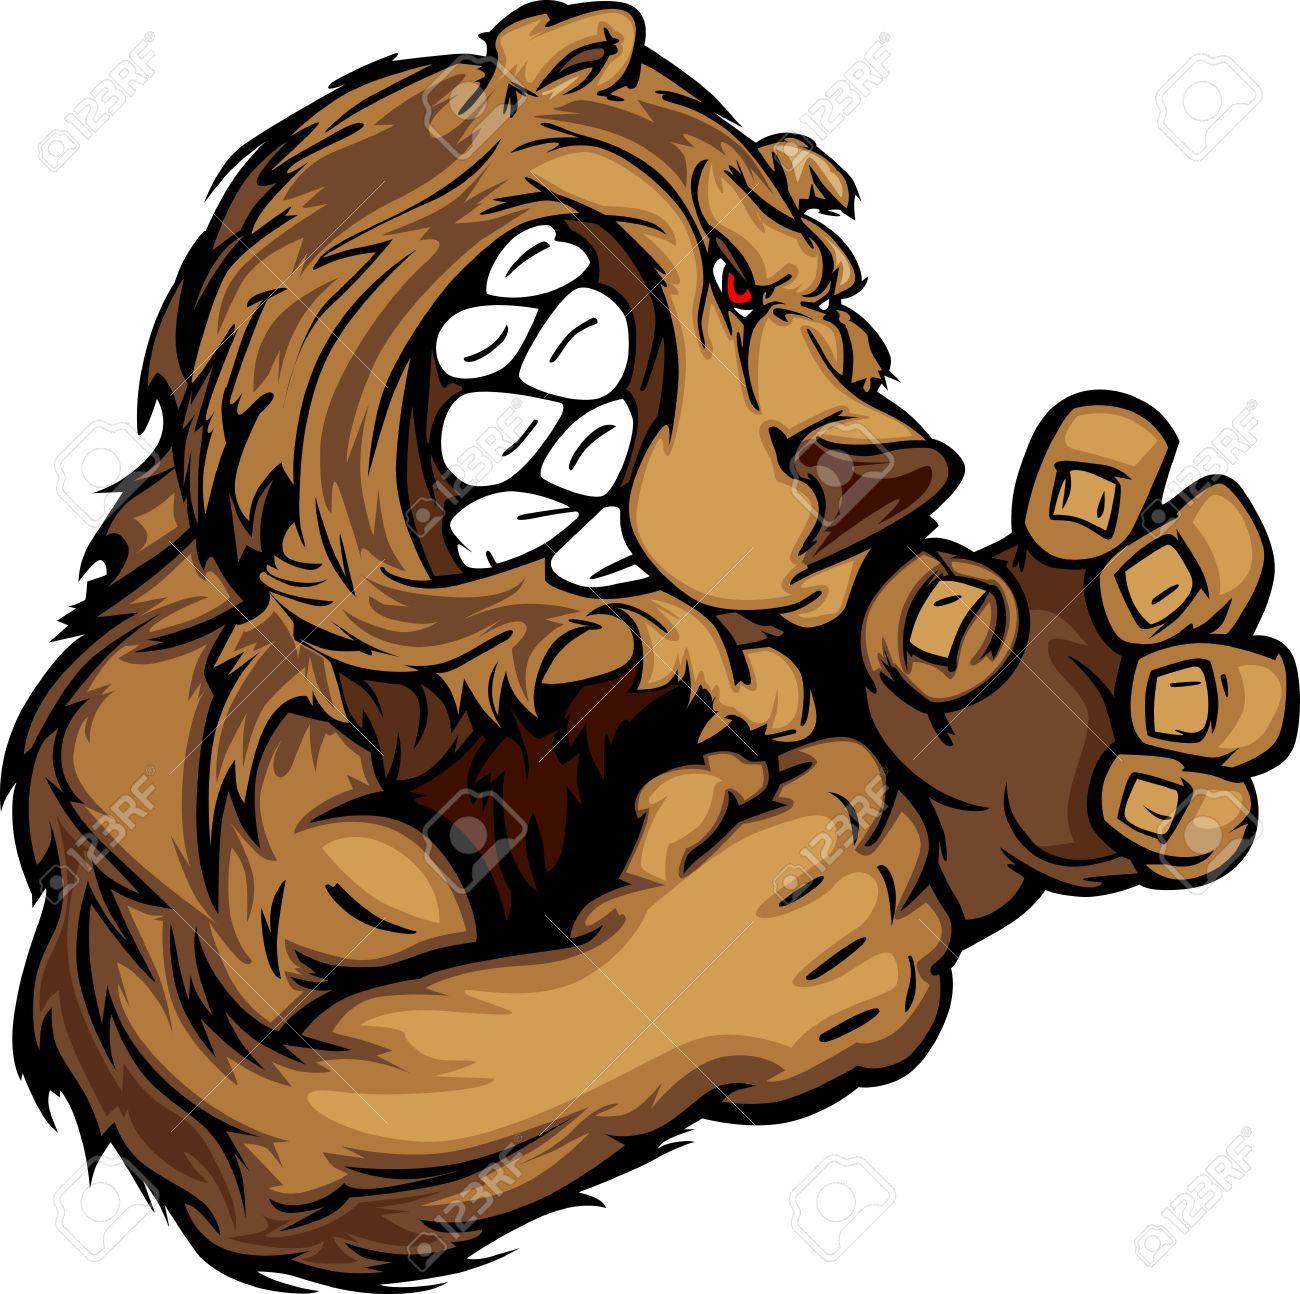 bear fighting mascot body illustration royalty free cliparts, vectors, and  stock illustration. image 11696897.  123rf